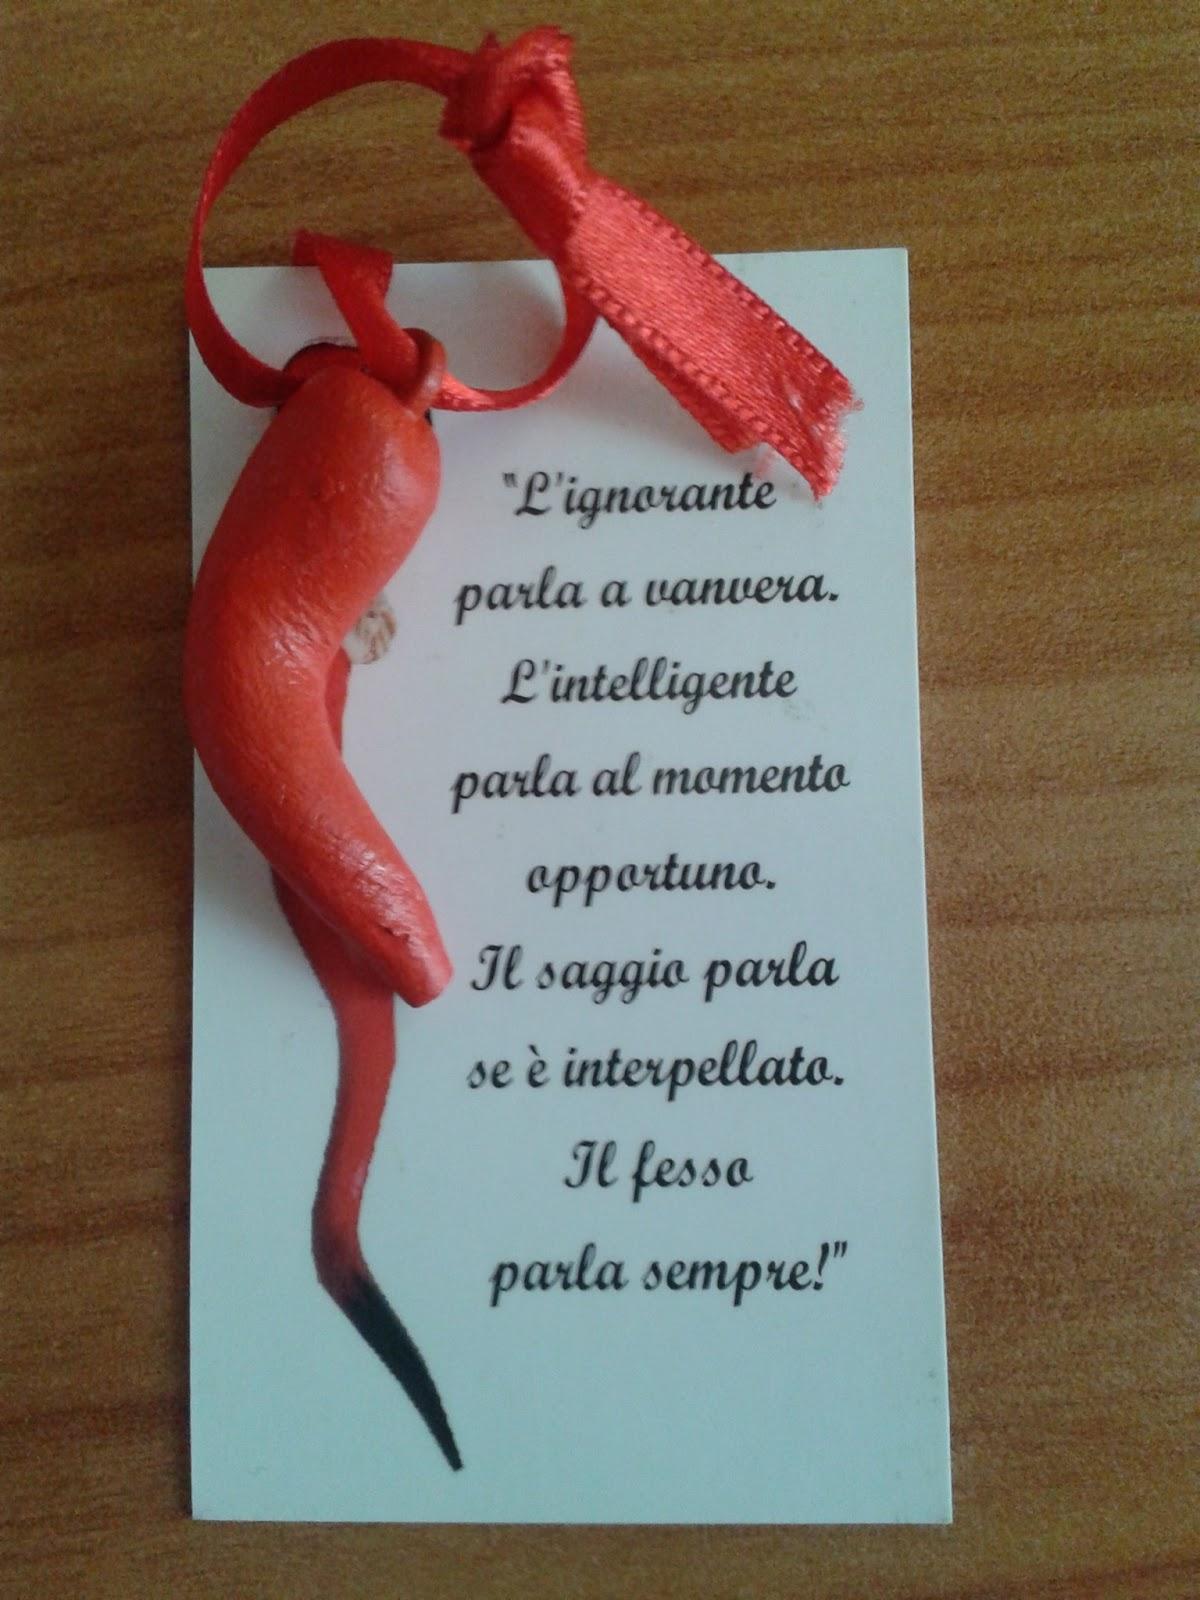 Frasi portafortuna napoletane - Foto porta fortuna ...